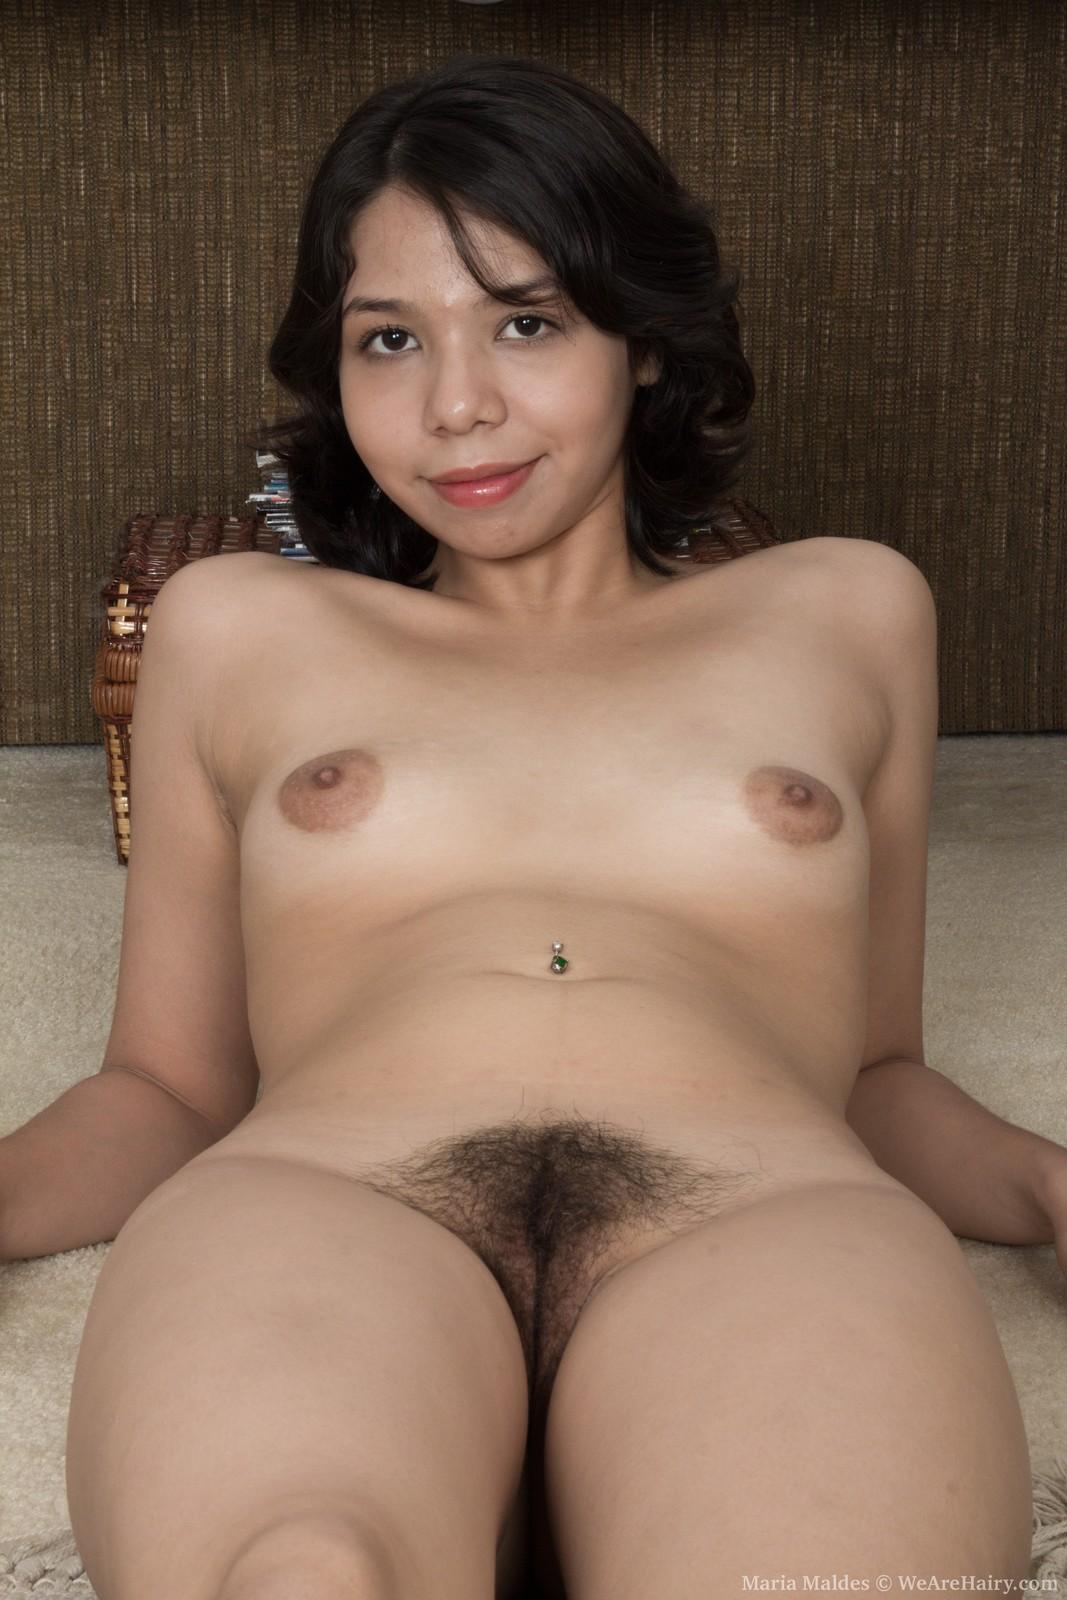 Real selena gomez nudes